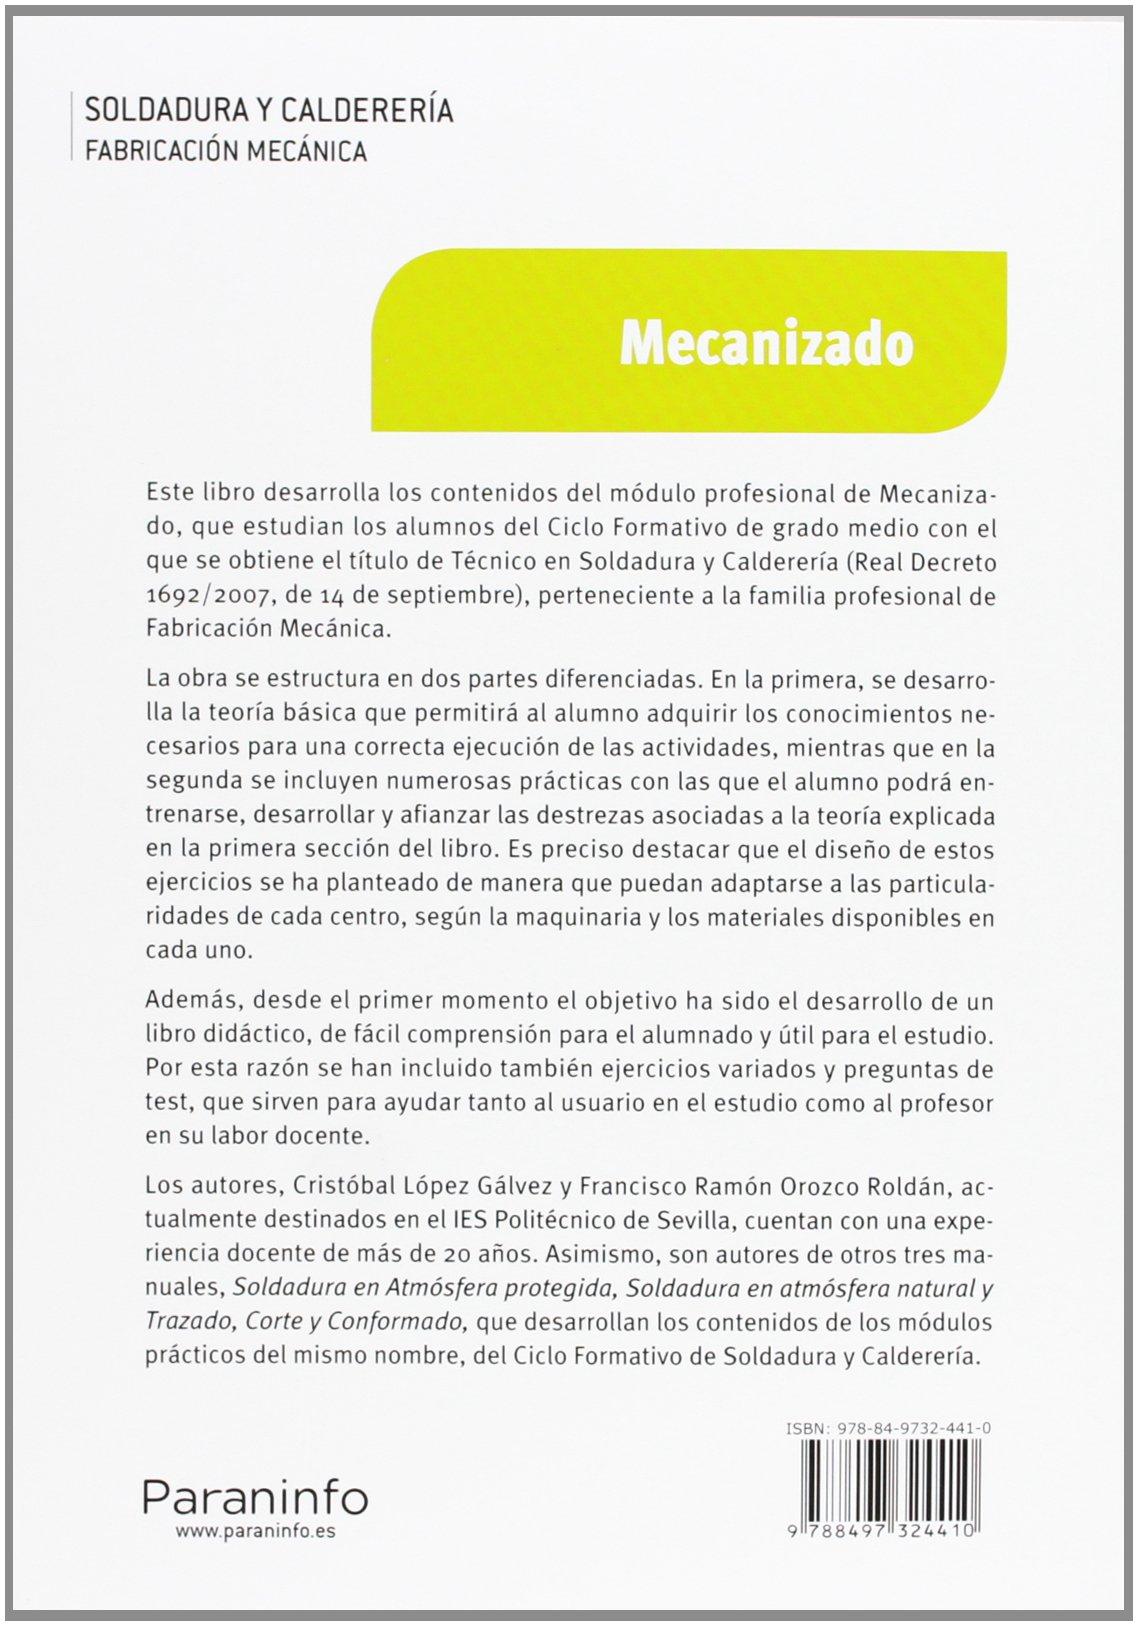 Mecanizado: Amazon.es: FRANCISCO RAMÓN OROZCO ROLDÁN, CRISTOBAL LÓPEZ GÁLVEZ: Libros